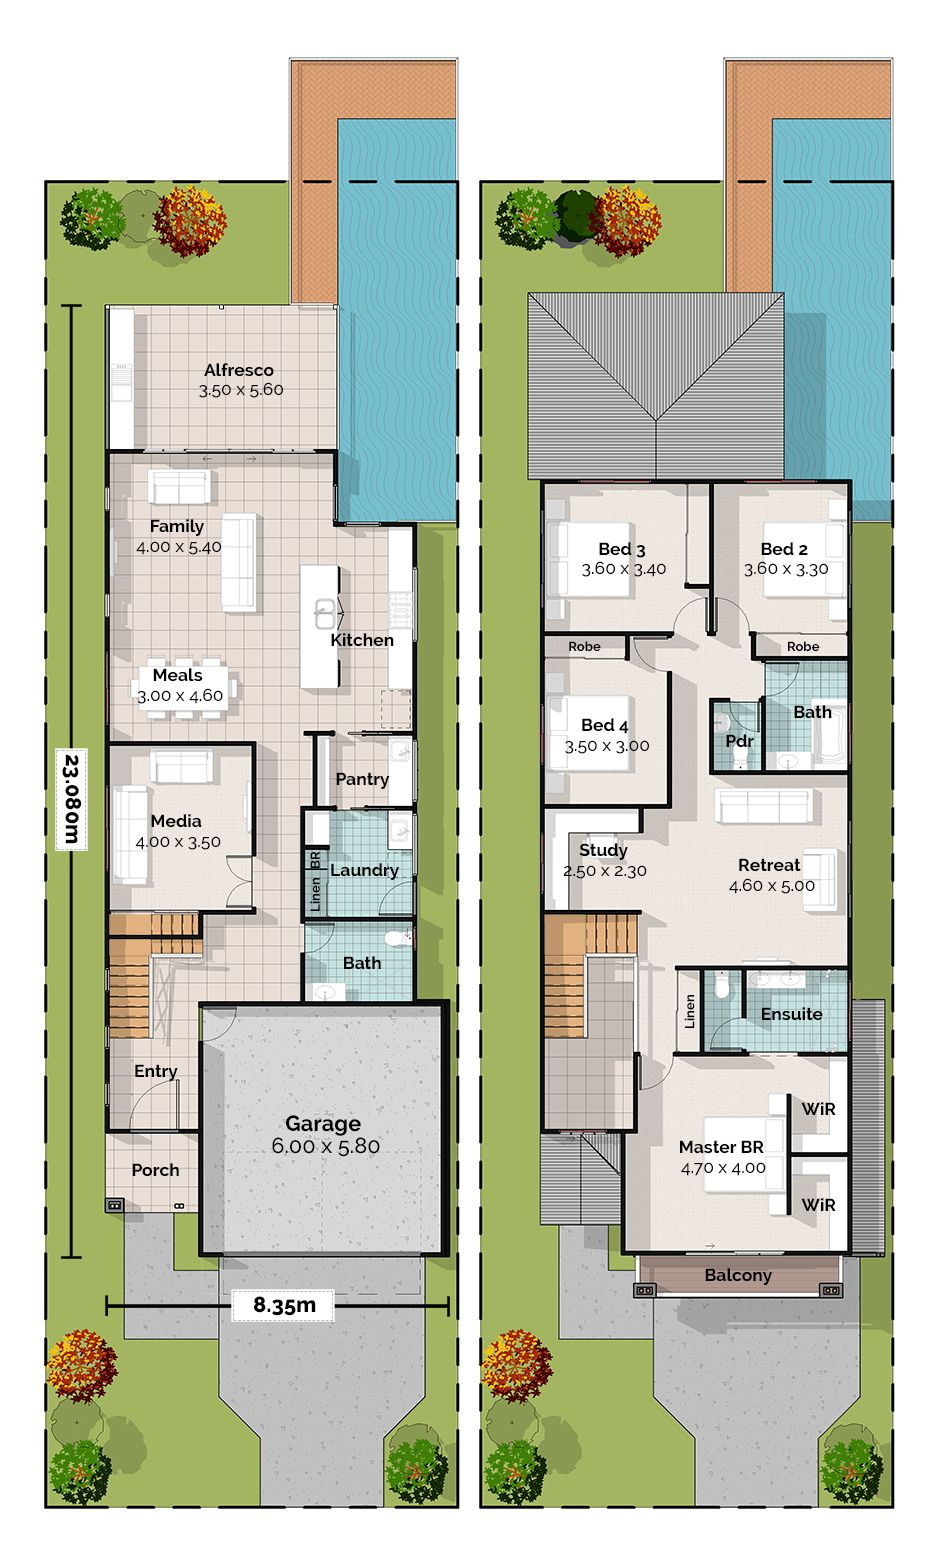 Enoggerra Two Storey House Plan Two Storey House Plans Narrow House Plans Narrow House Designs